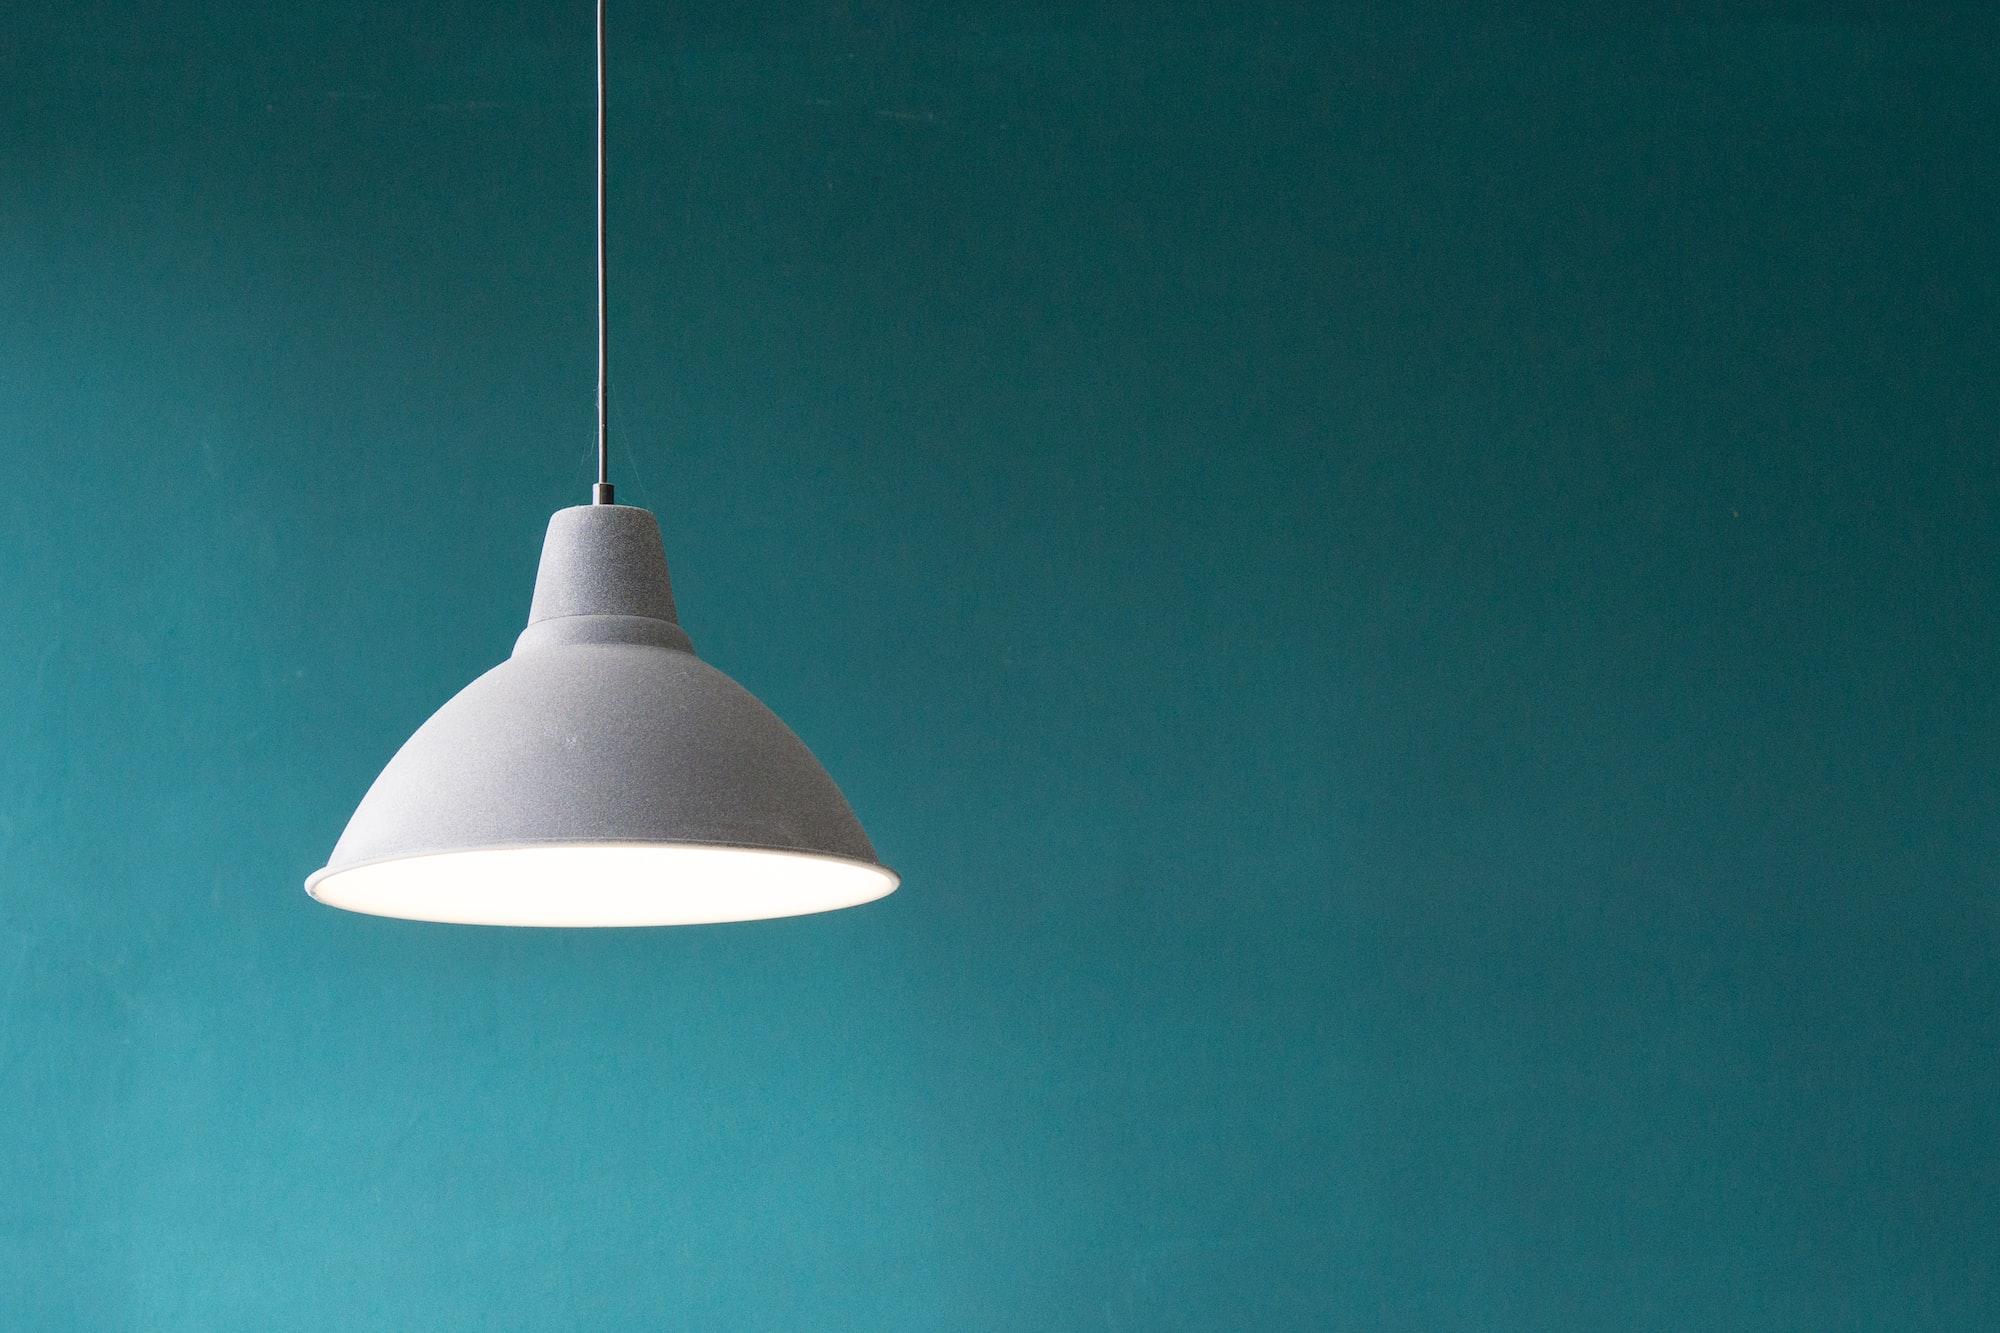 Energieeffiziente Beleuchtung